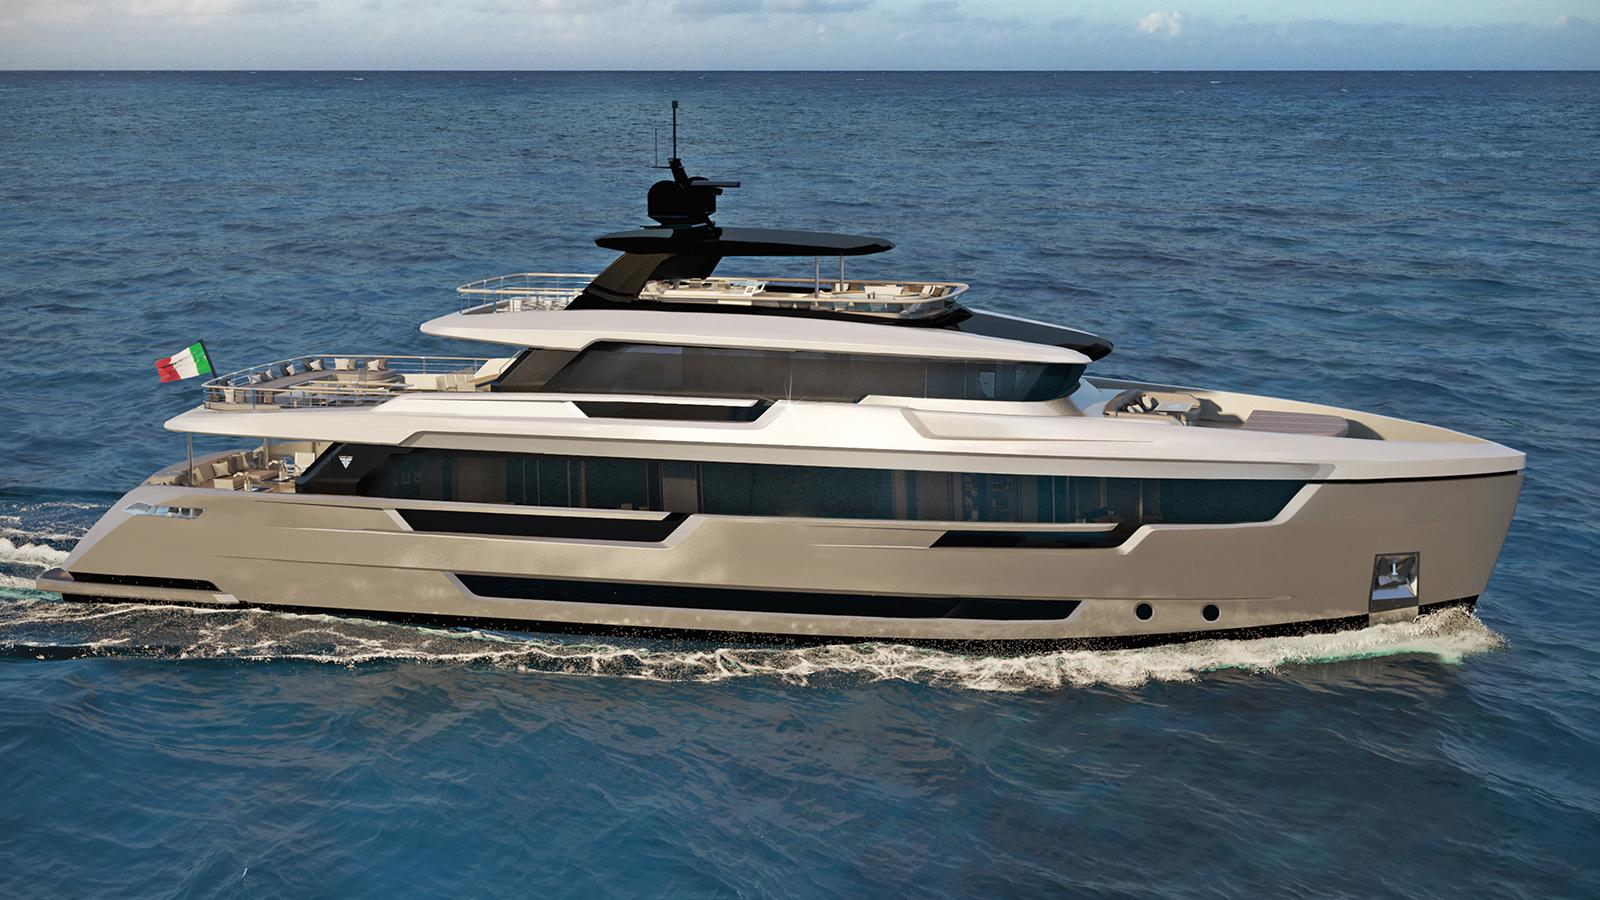 aerial-view-of-the-filippetti-e32-yacht-concept